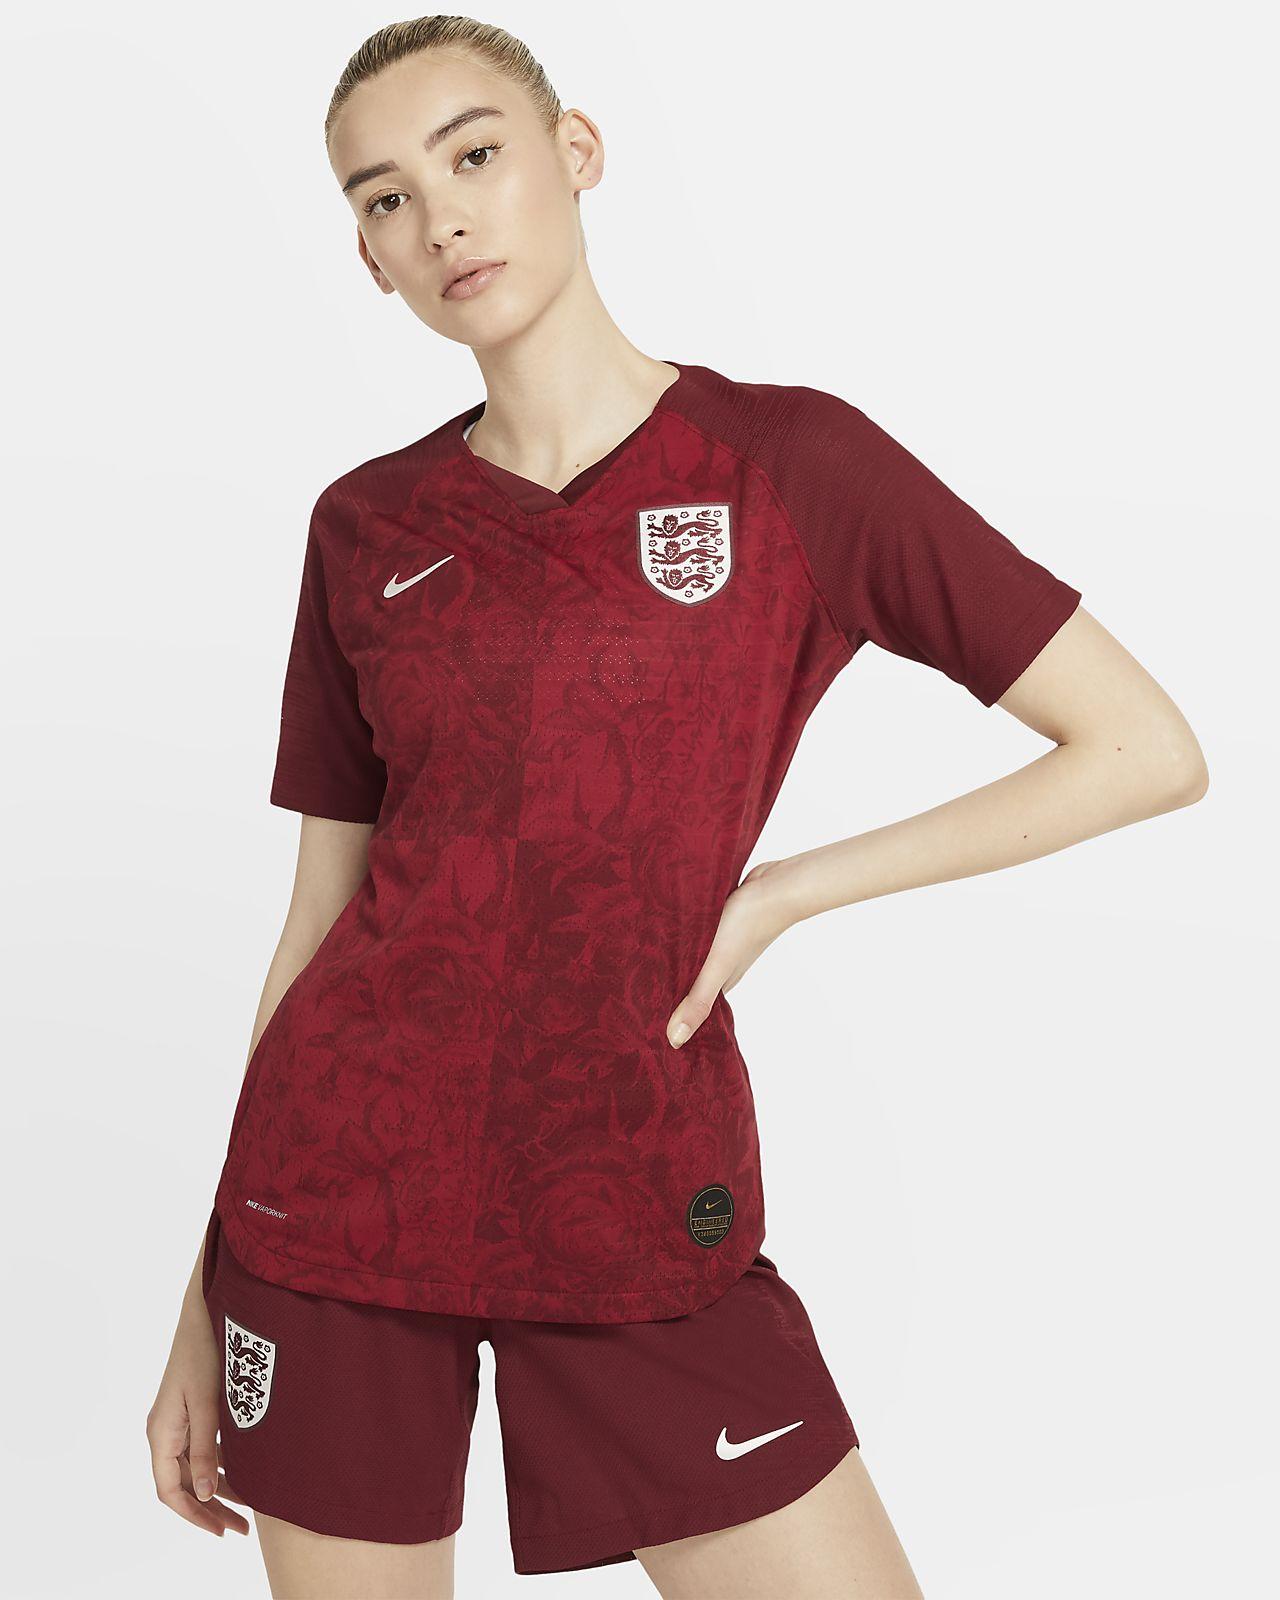 Camiseta de fútbol para mujer England 2019 Vapor Match Away